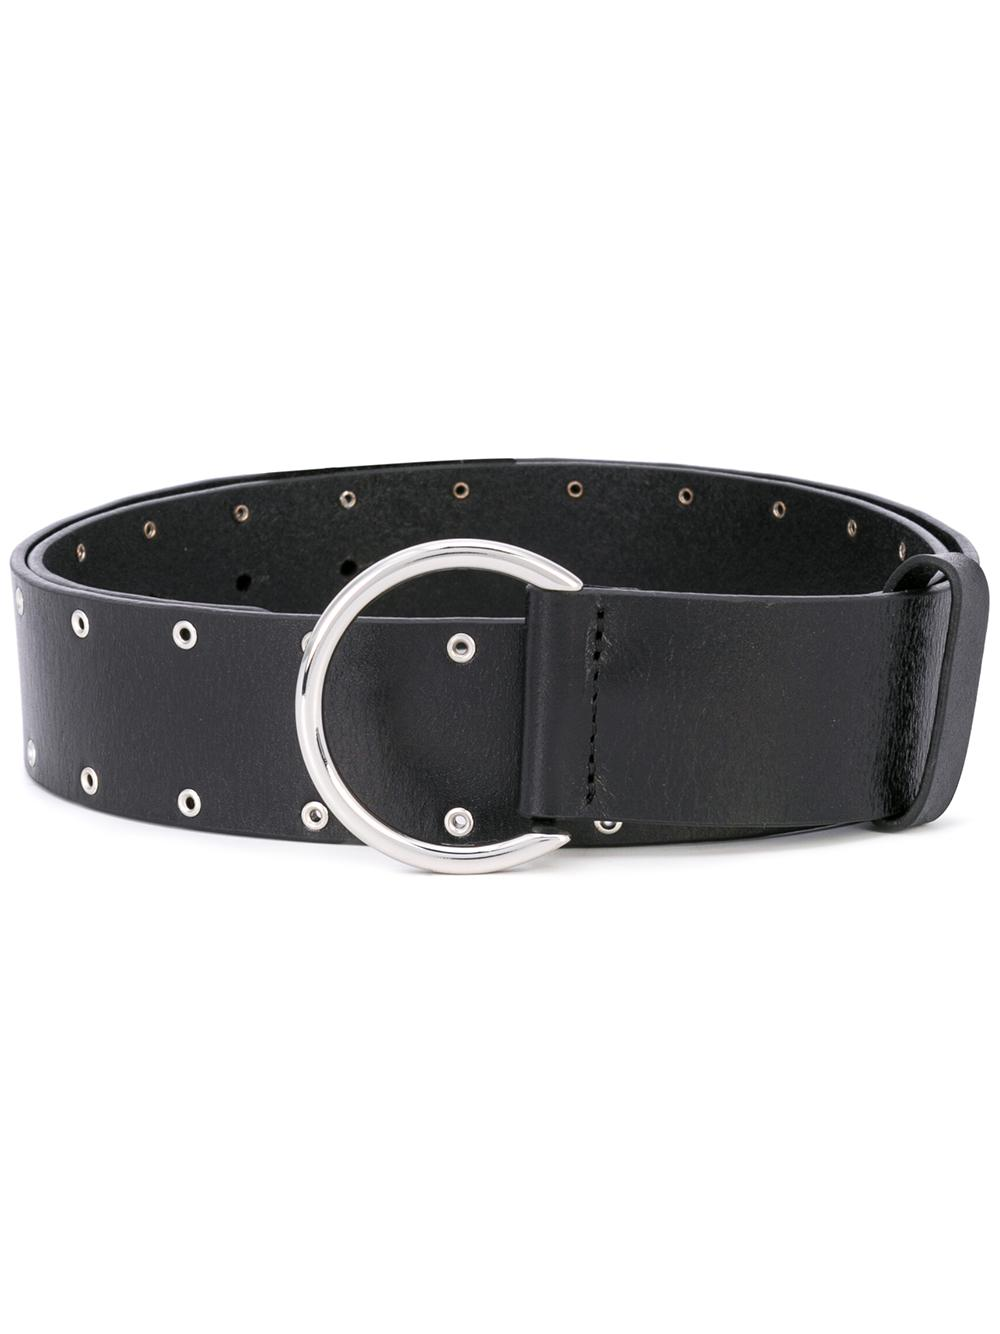 O- Ring Grommet Hip Belt Item # LWBT0050